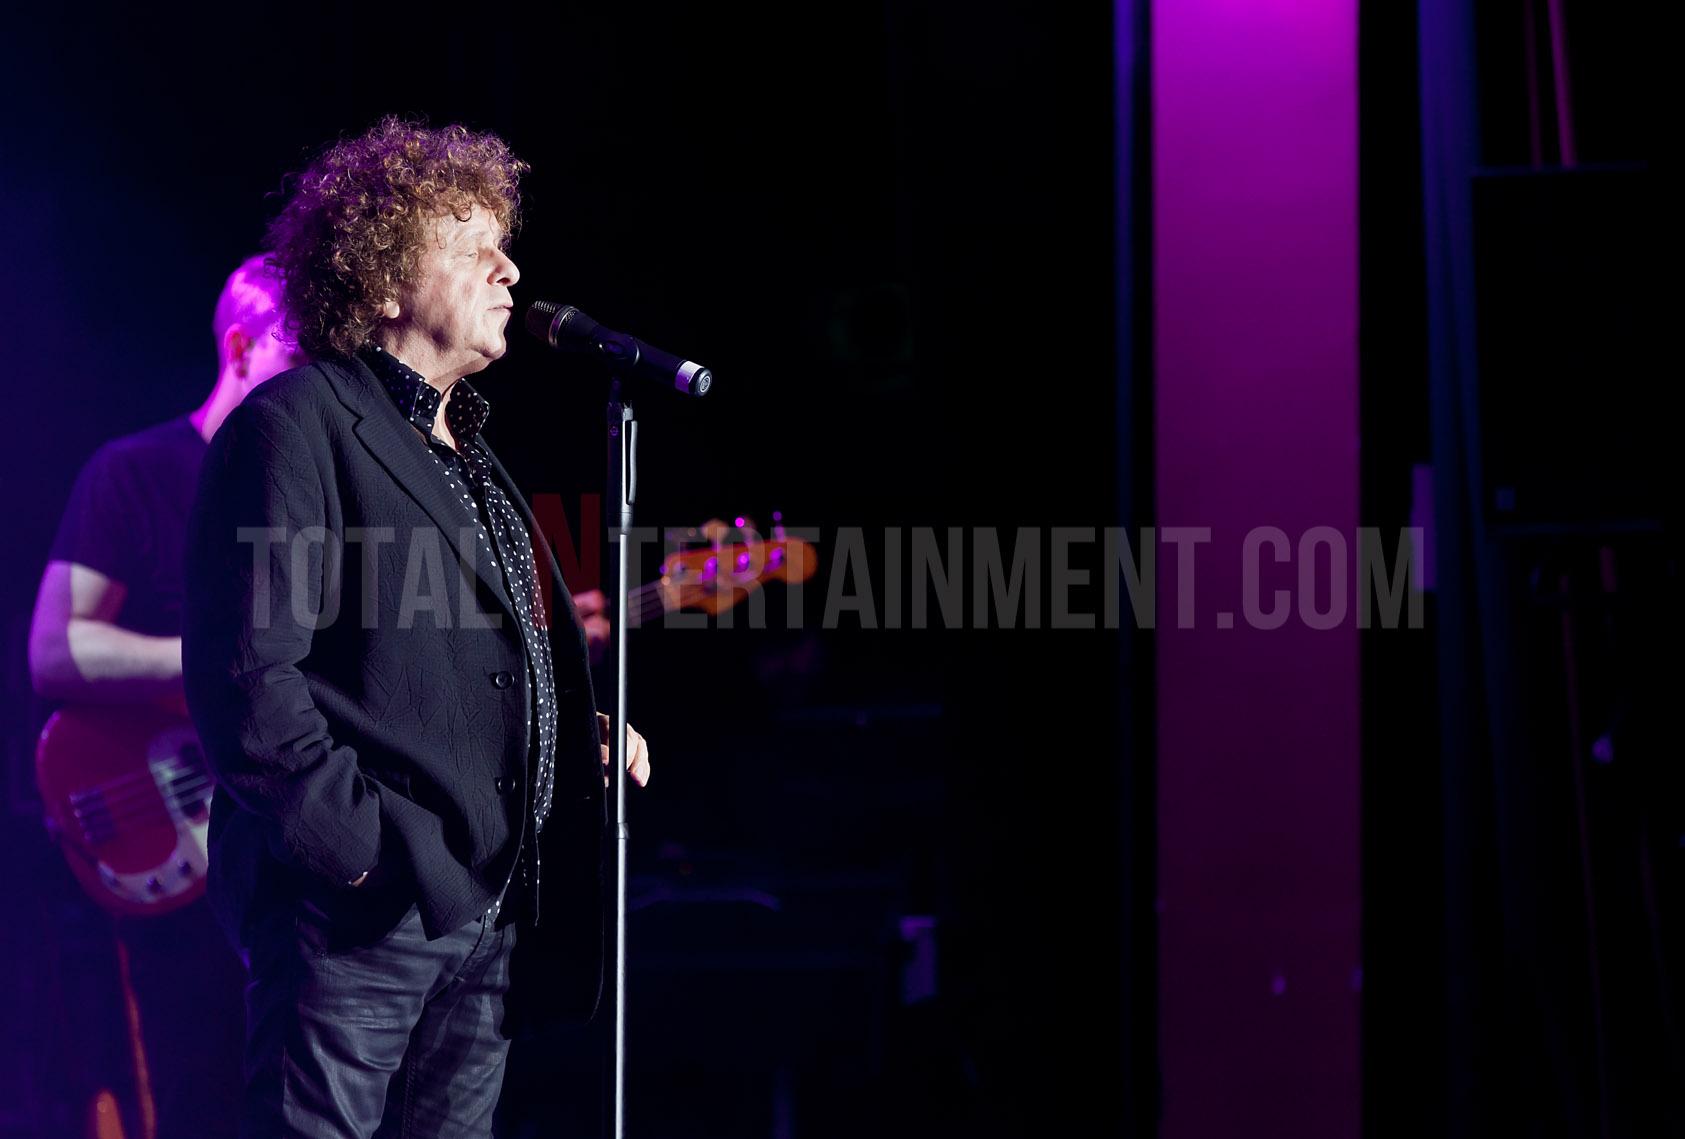 Leo Sayer, Liverpool, Concert, Live Event